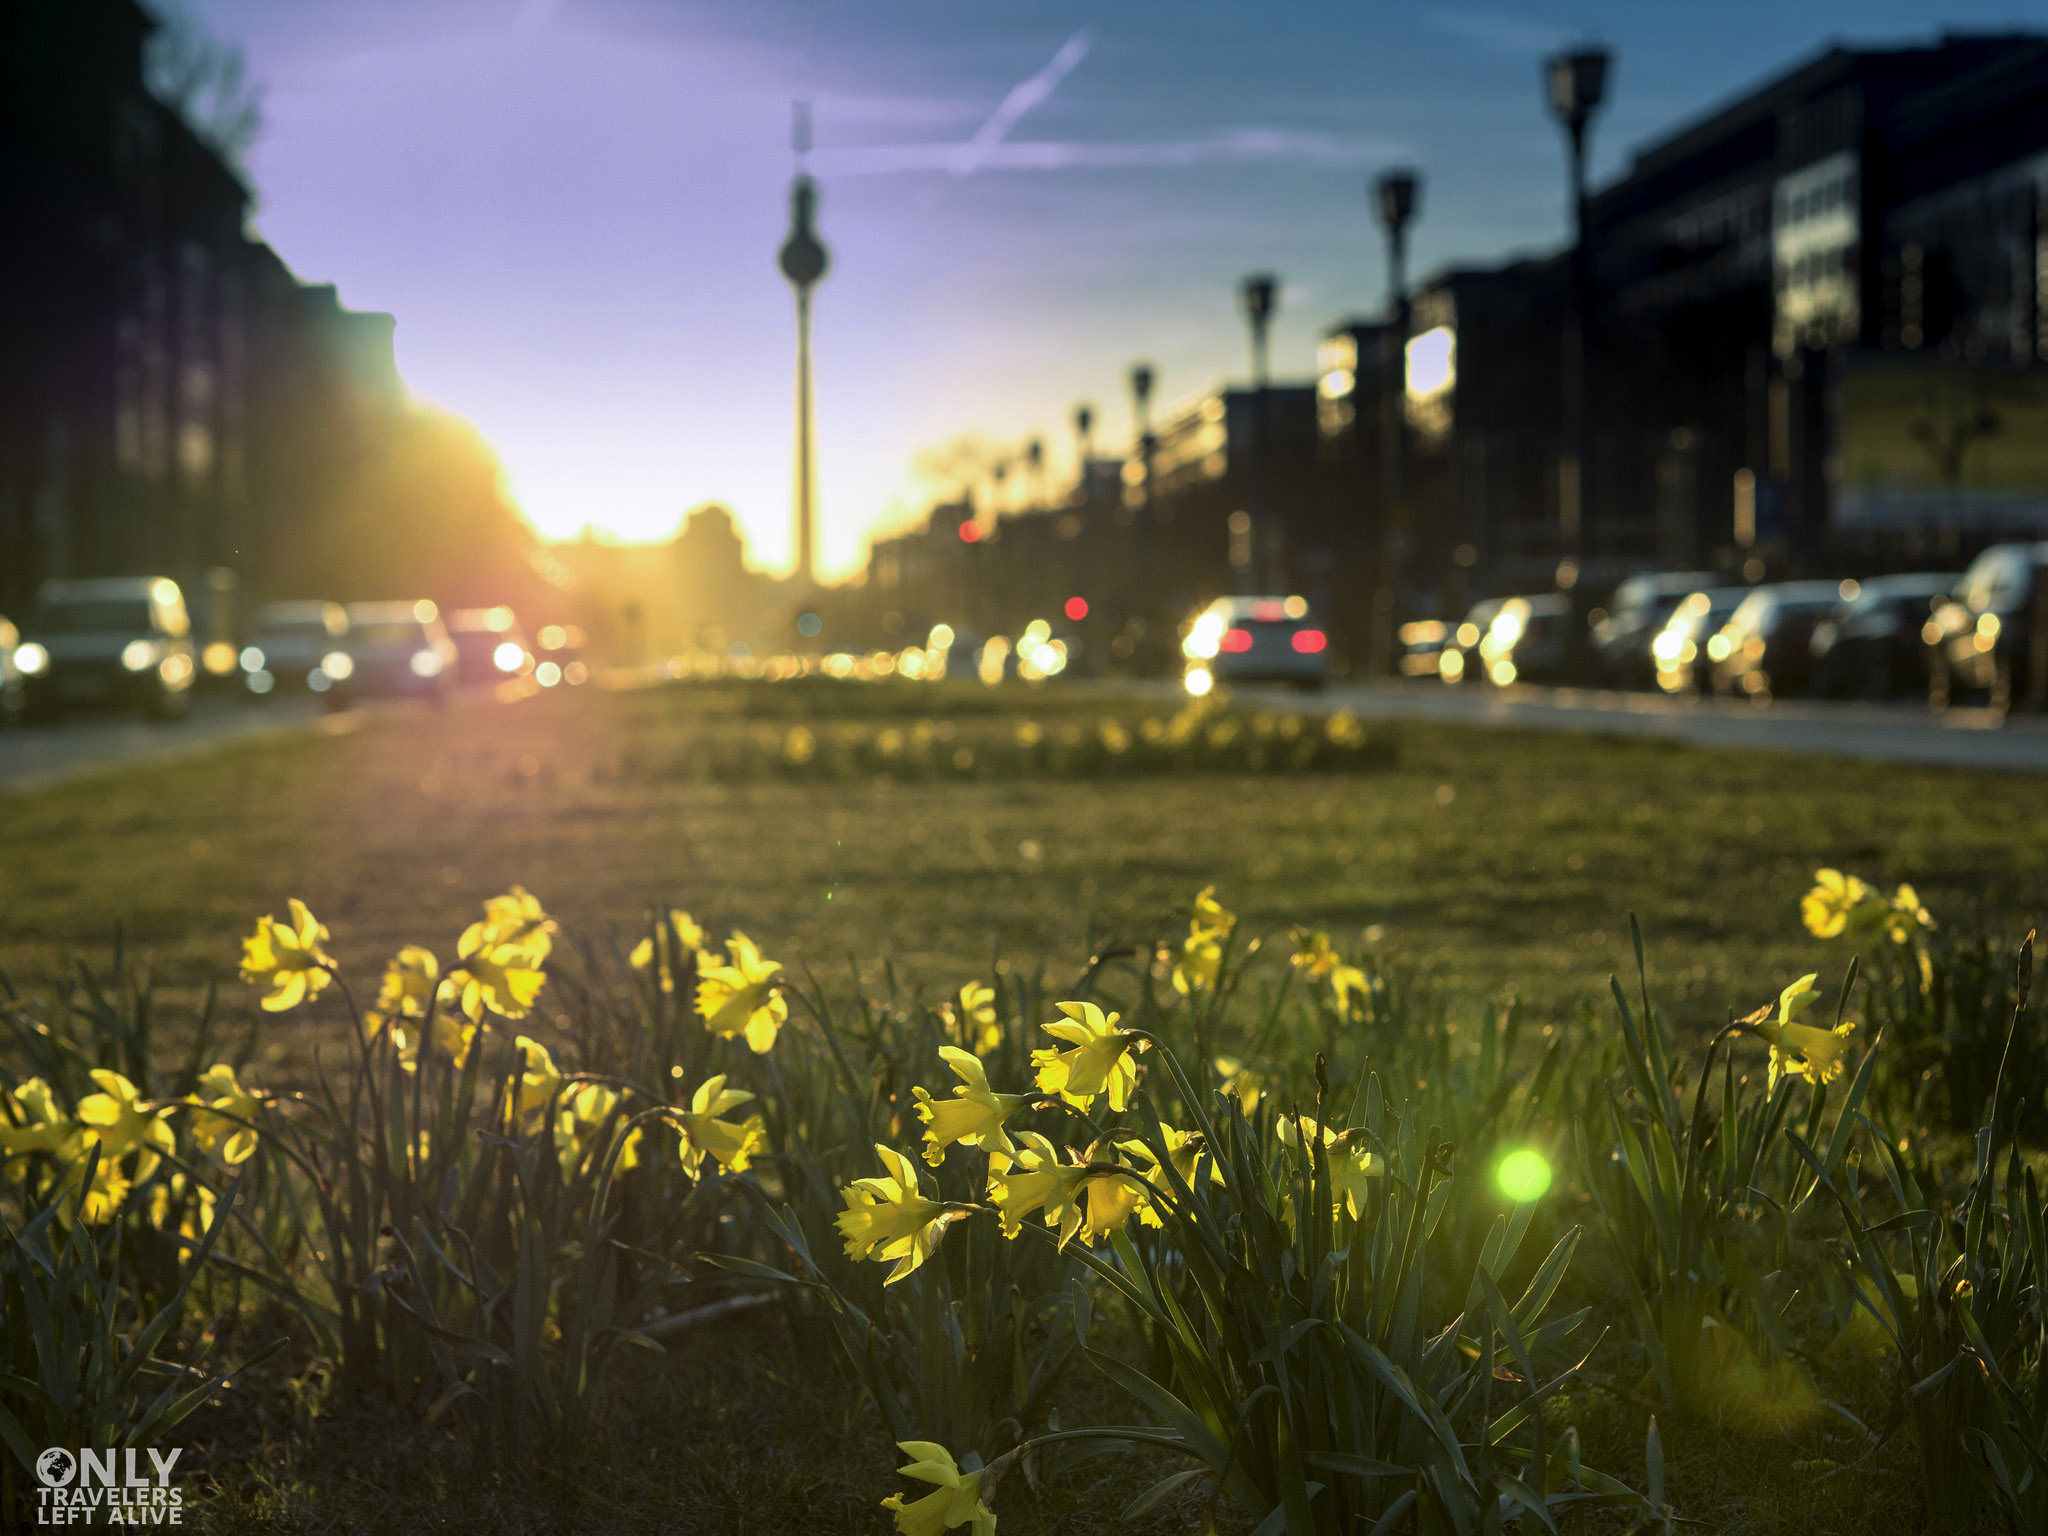 Berlin karl marx stadt only travelers left alive